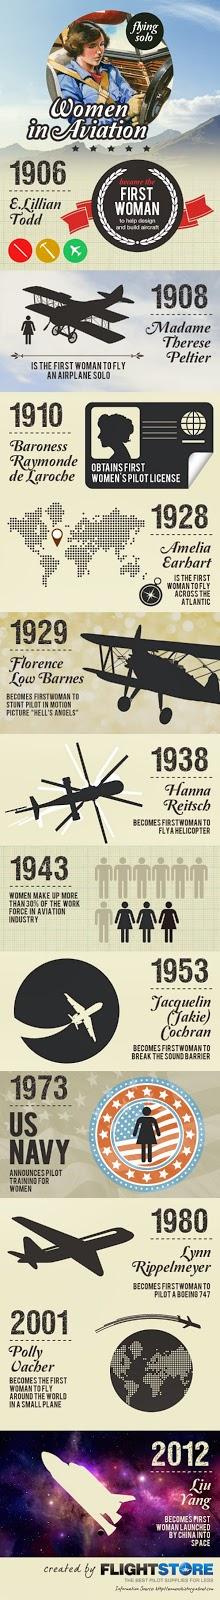 History of Women in Aviation